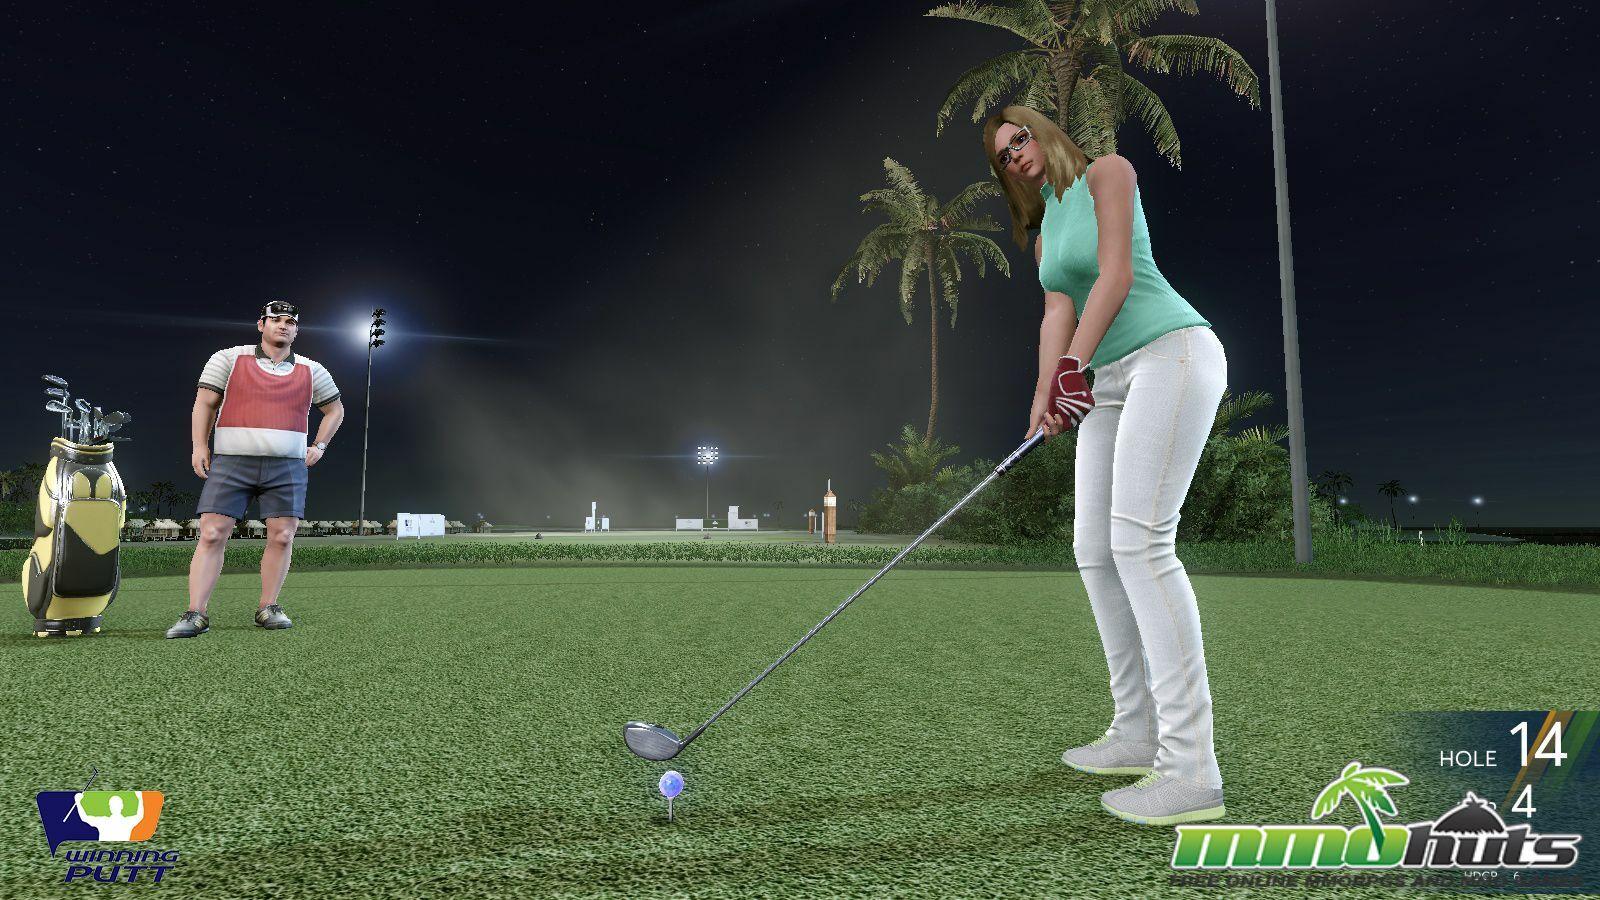 Winning Putt Thumbnail Gameplay stroke golf girl